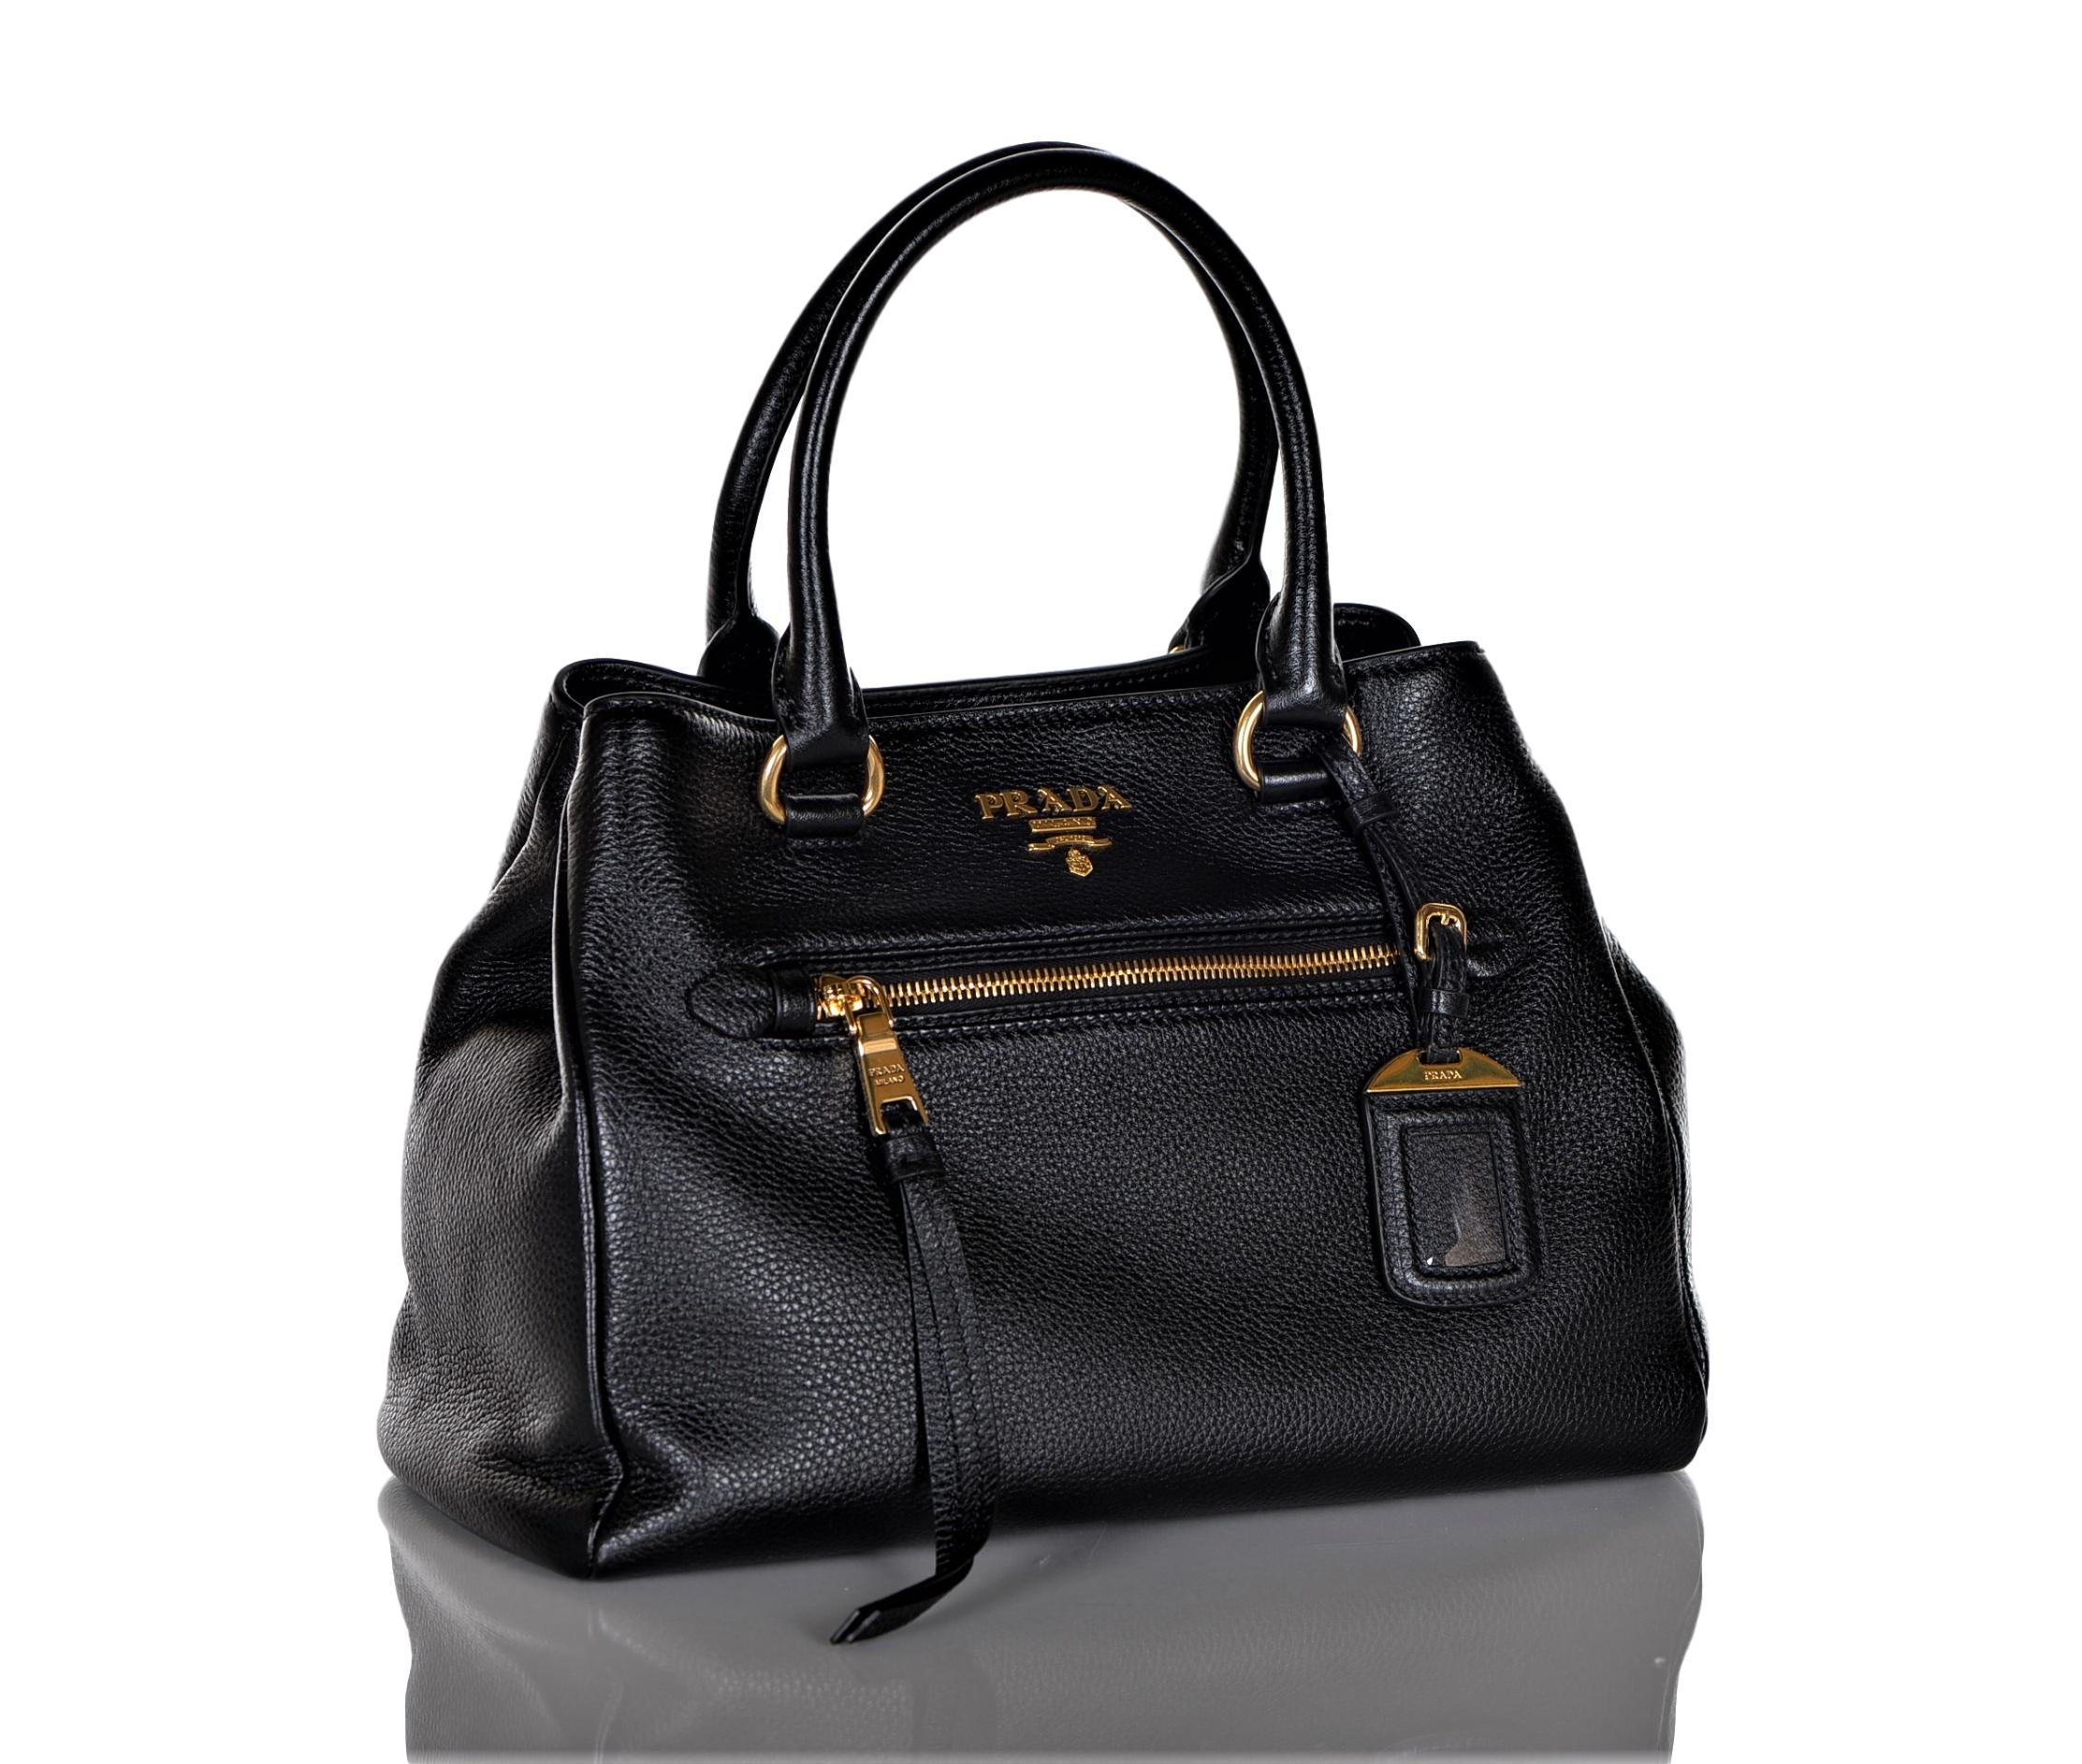 ef52ebb38693 Prada 1BG044 Women s Vitello Phenix Leather Convertible Bag Black ...